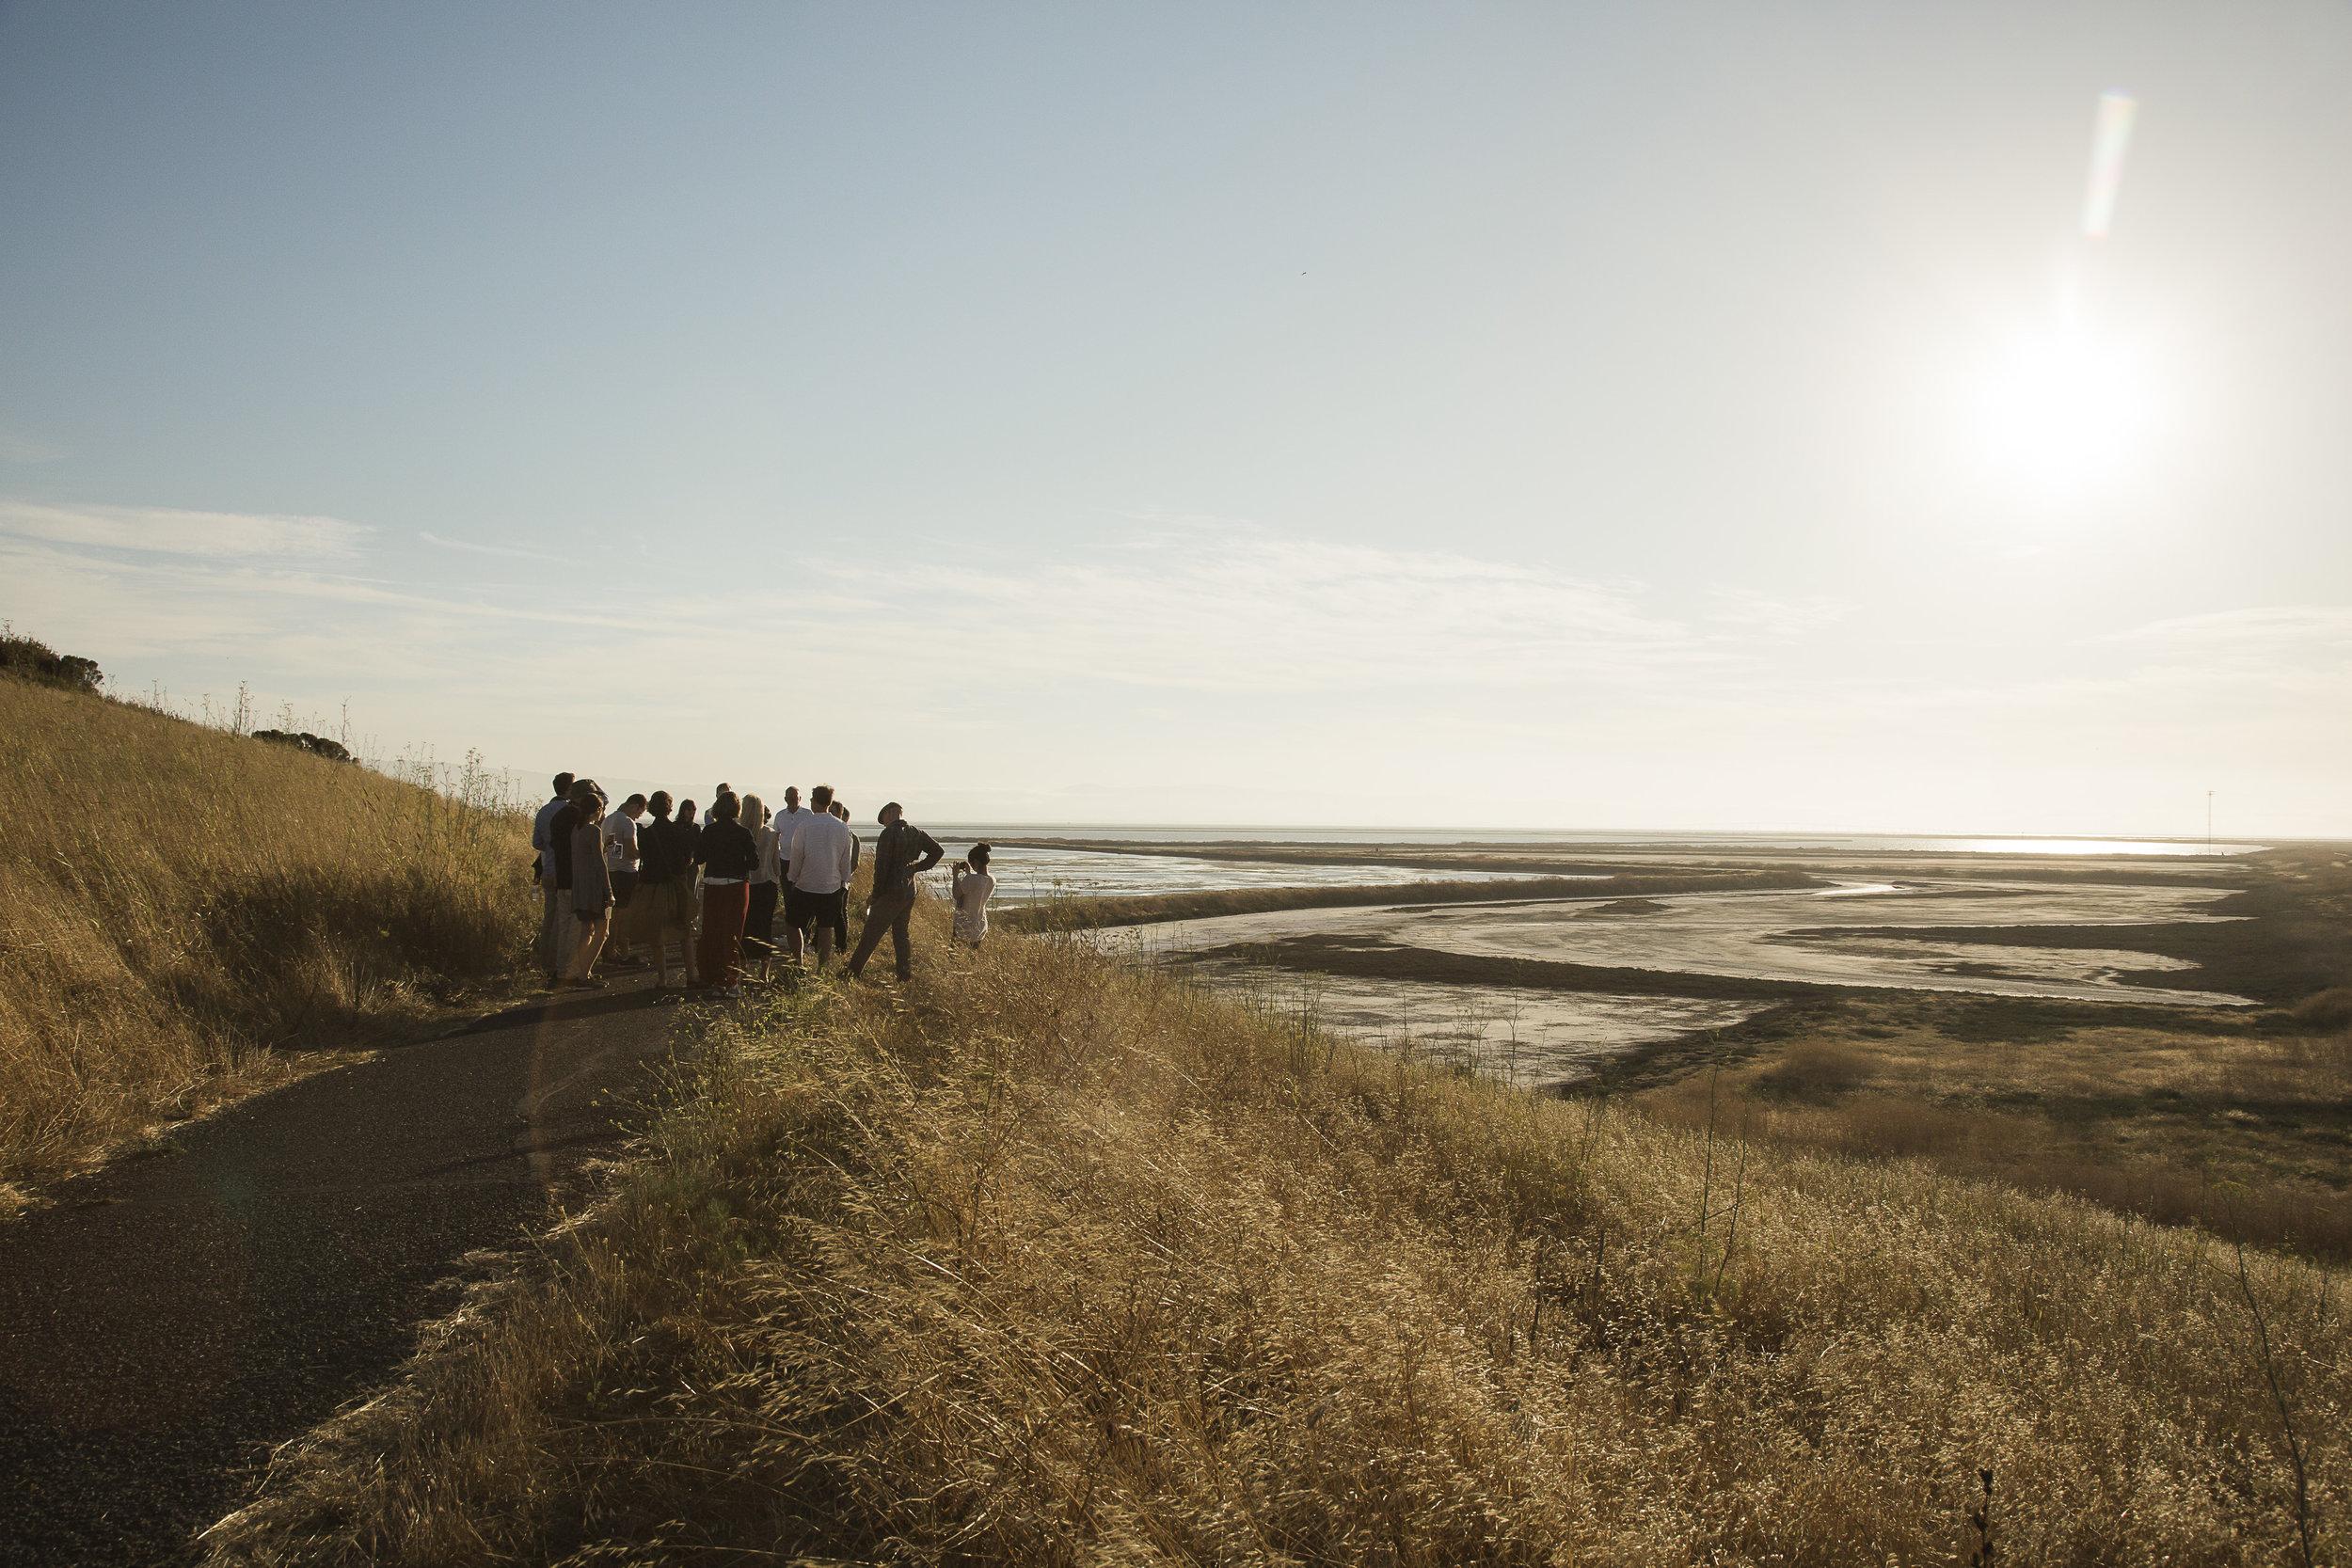 Team Public Sediment giving a tour of the Alameda Creek Eden Landing Ecological Reserve to the Van Alen Institute Climate Council (July 2018).